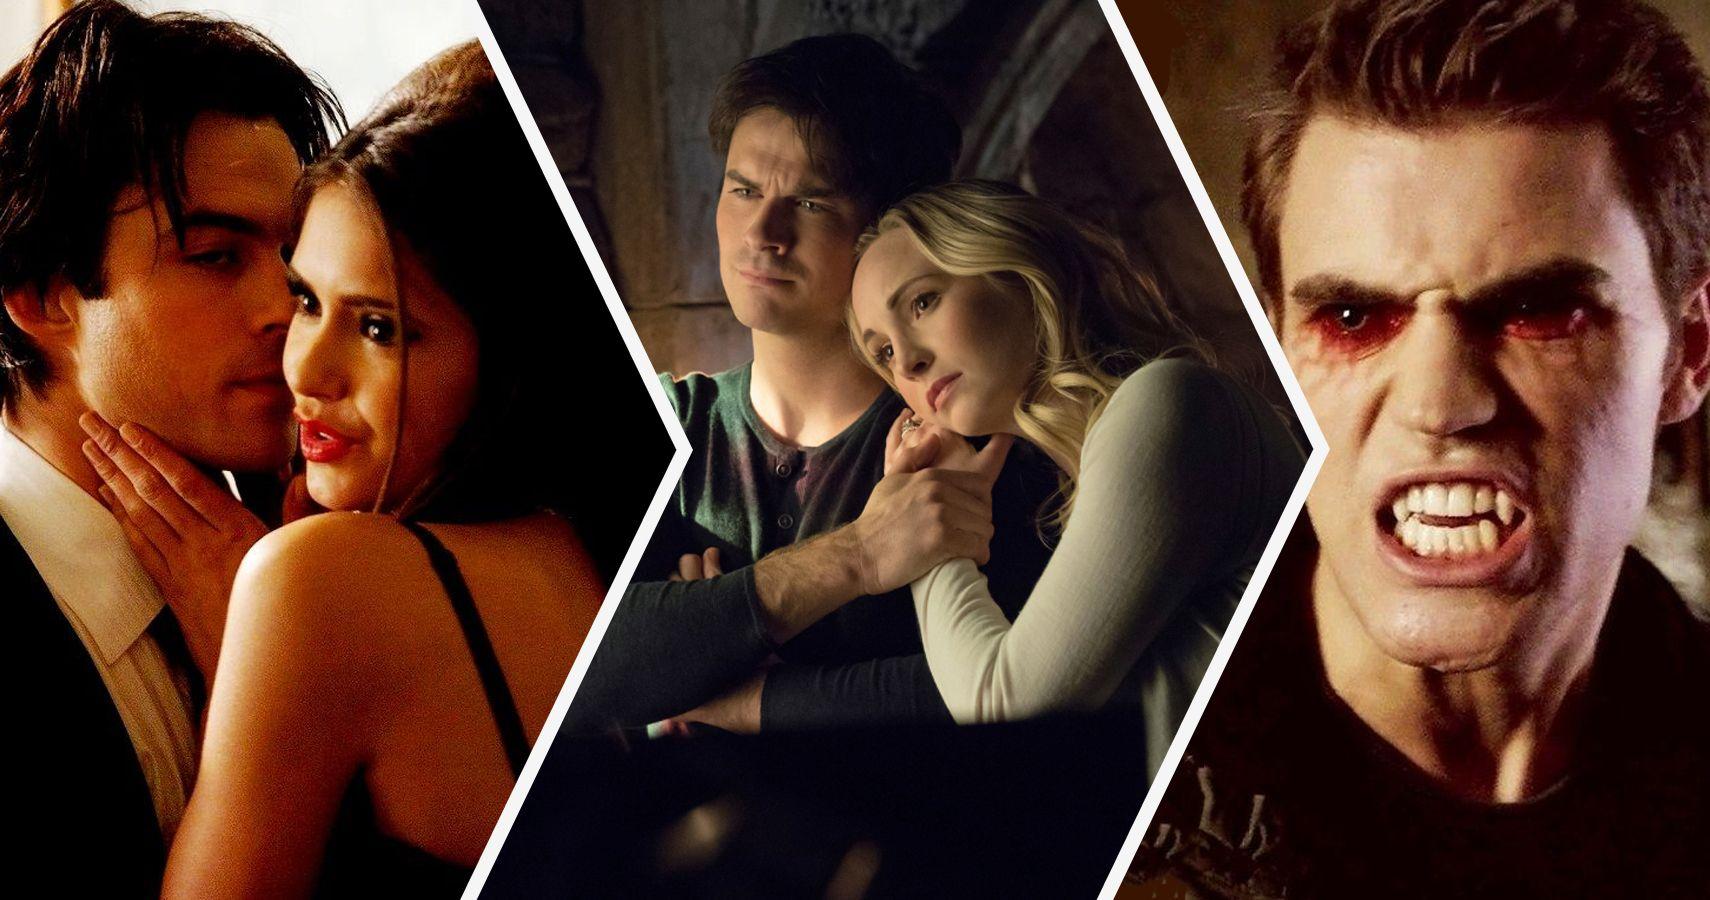 Vampire Diaries: 25 Things That Make No Sense About Damon